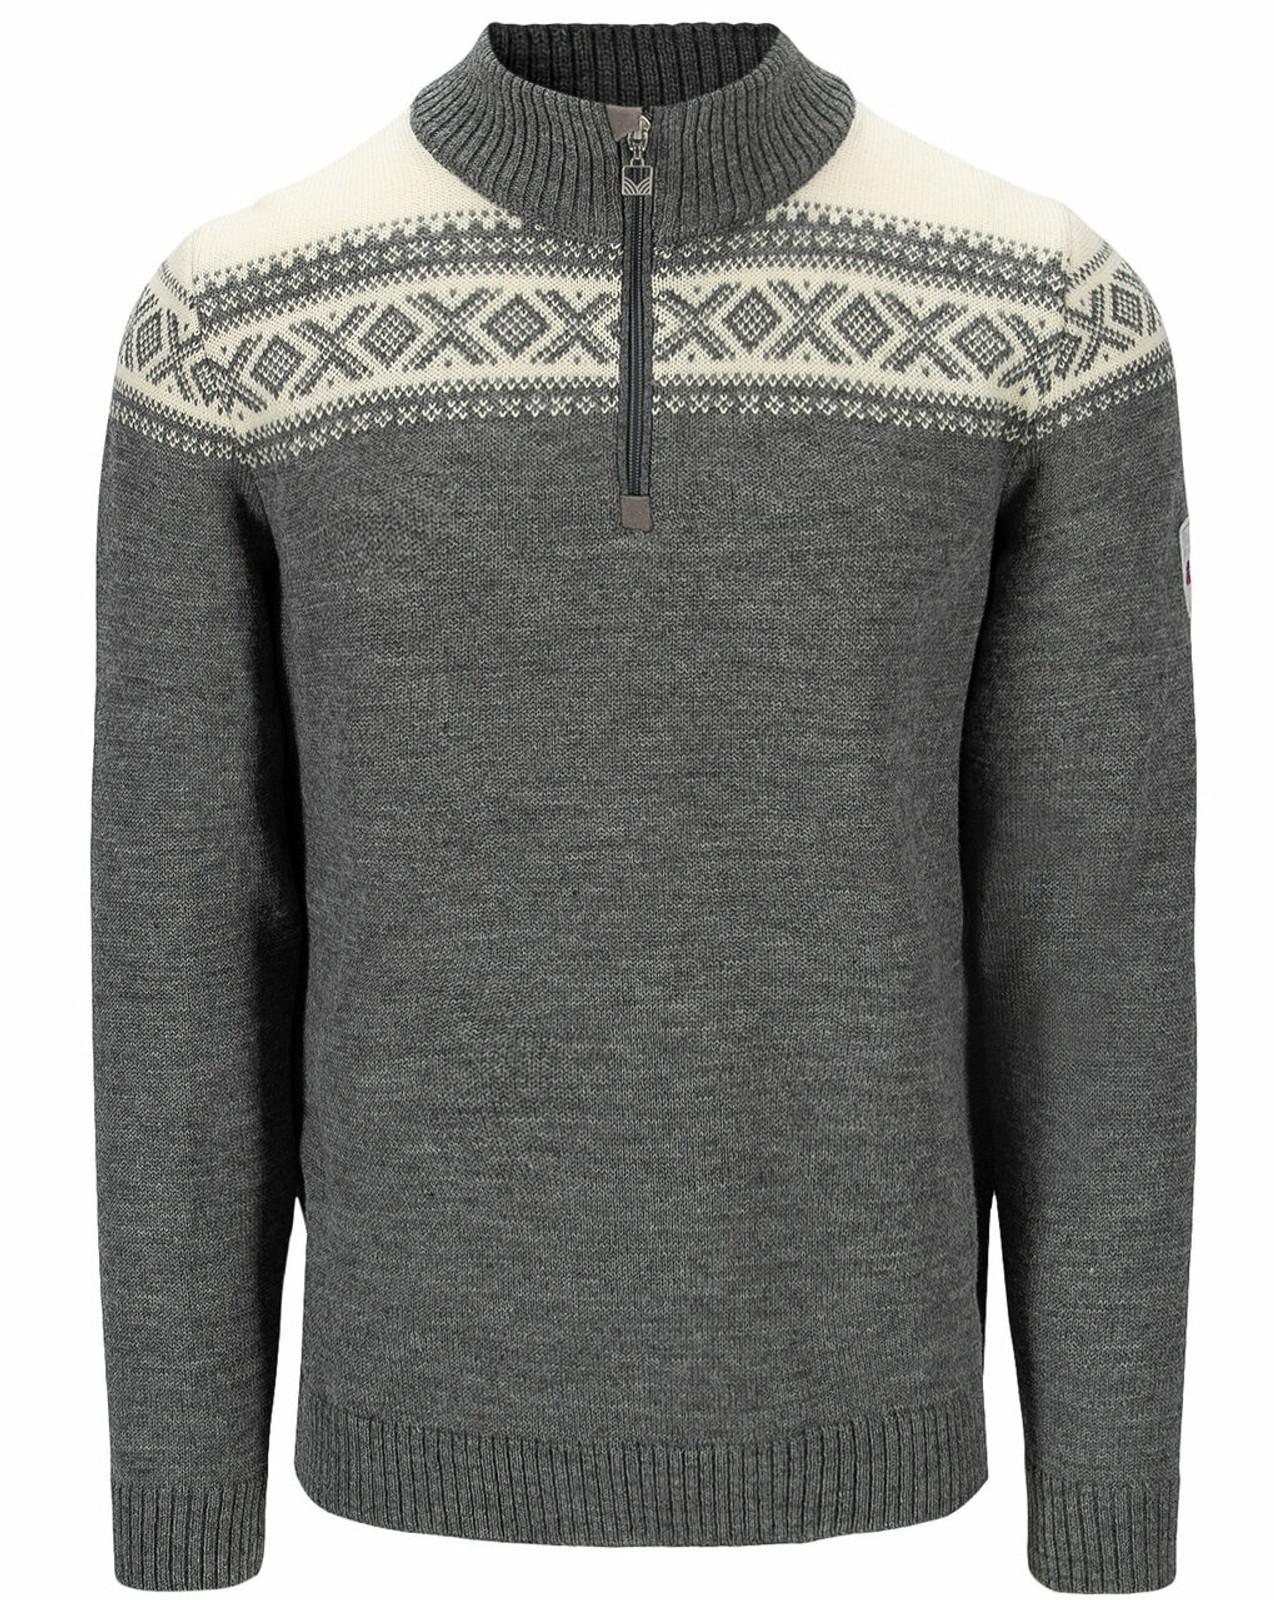 Dale of Norway Cortina Heron Men's Sweater, Smoke/Off White, 94951E